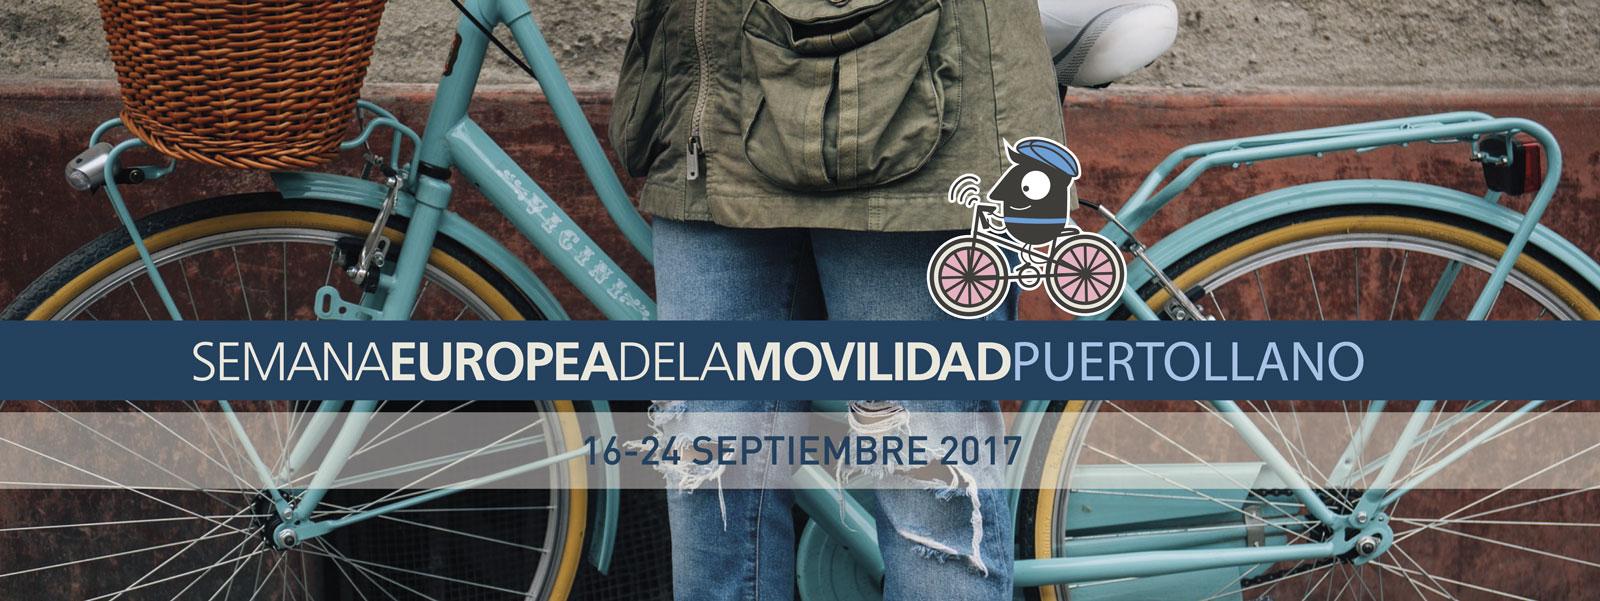 frontal bicicleta Semana Europea de la Movilidad 2017